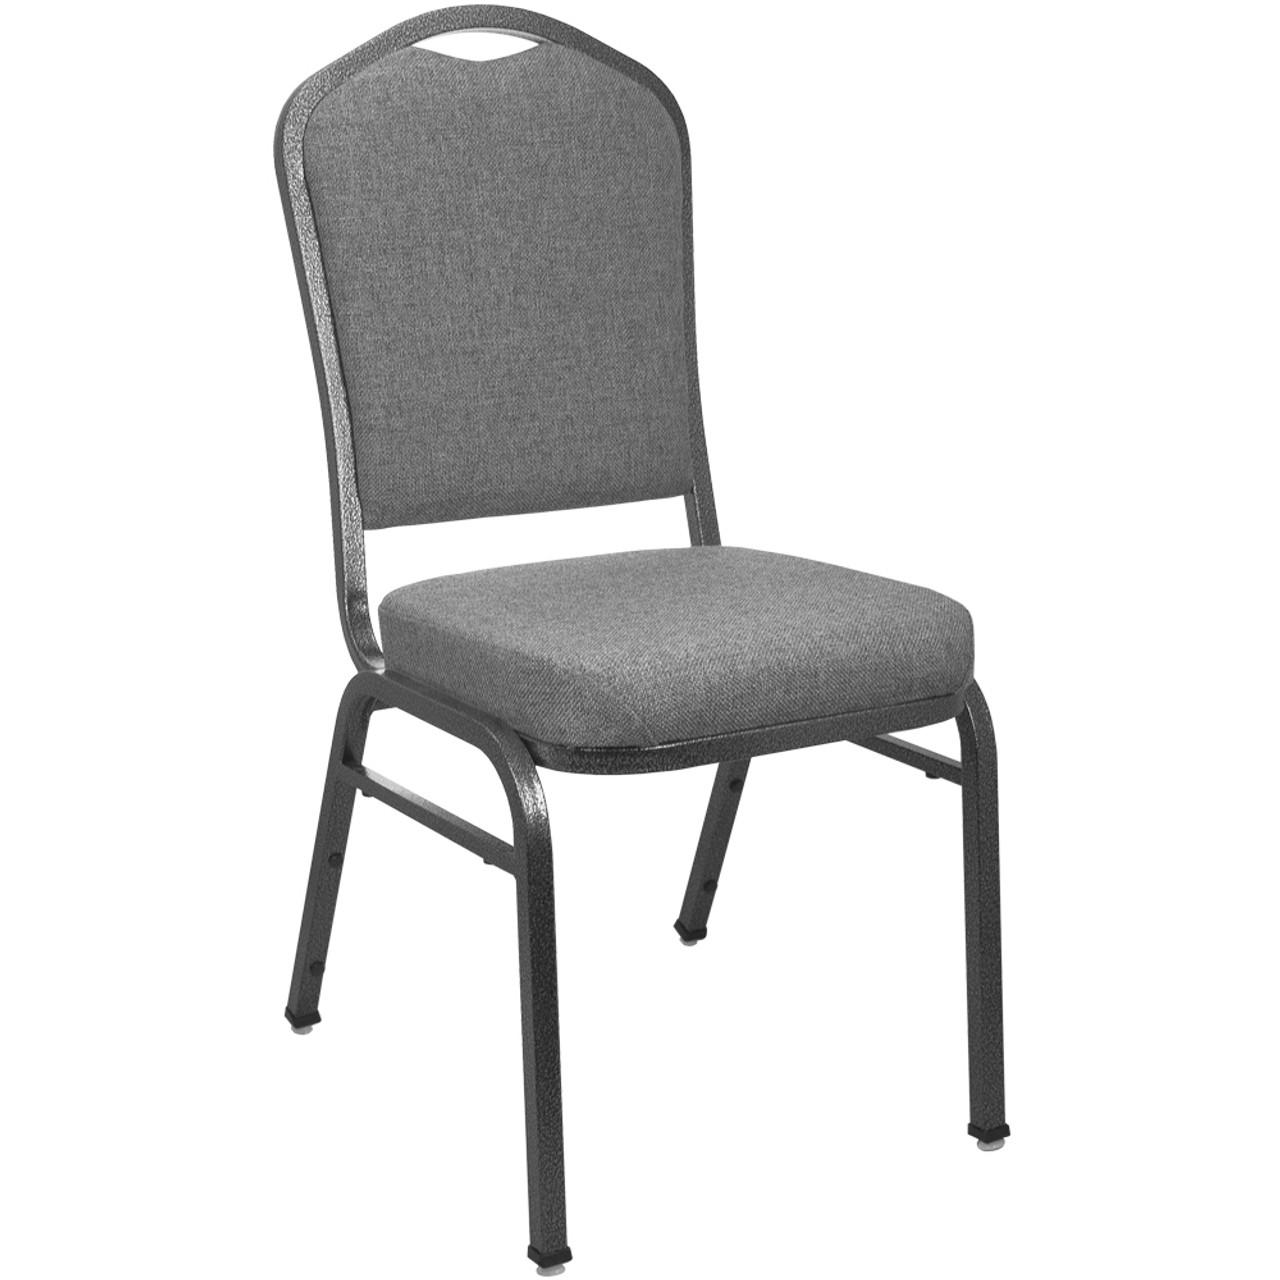 Peachy Advantage Premium Charcoal Gray Crown Back Banquet Chair Cbmw 211 Spiritservingveterans Wood Chair Design Ideas Spiritservingveteransorg